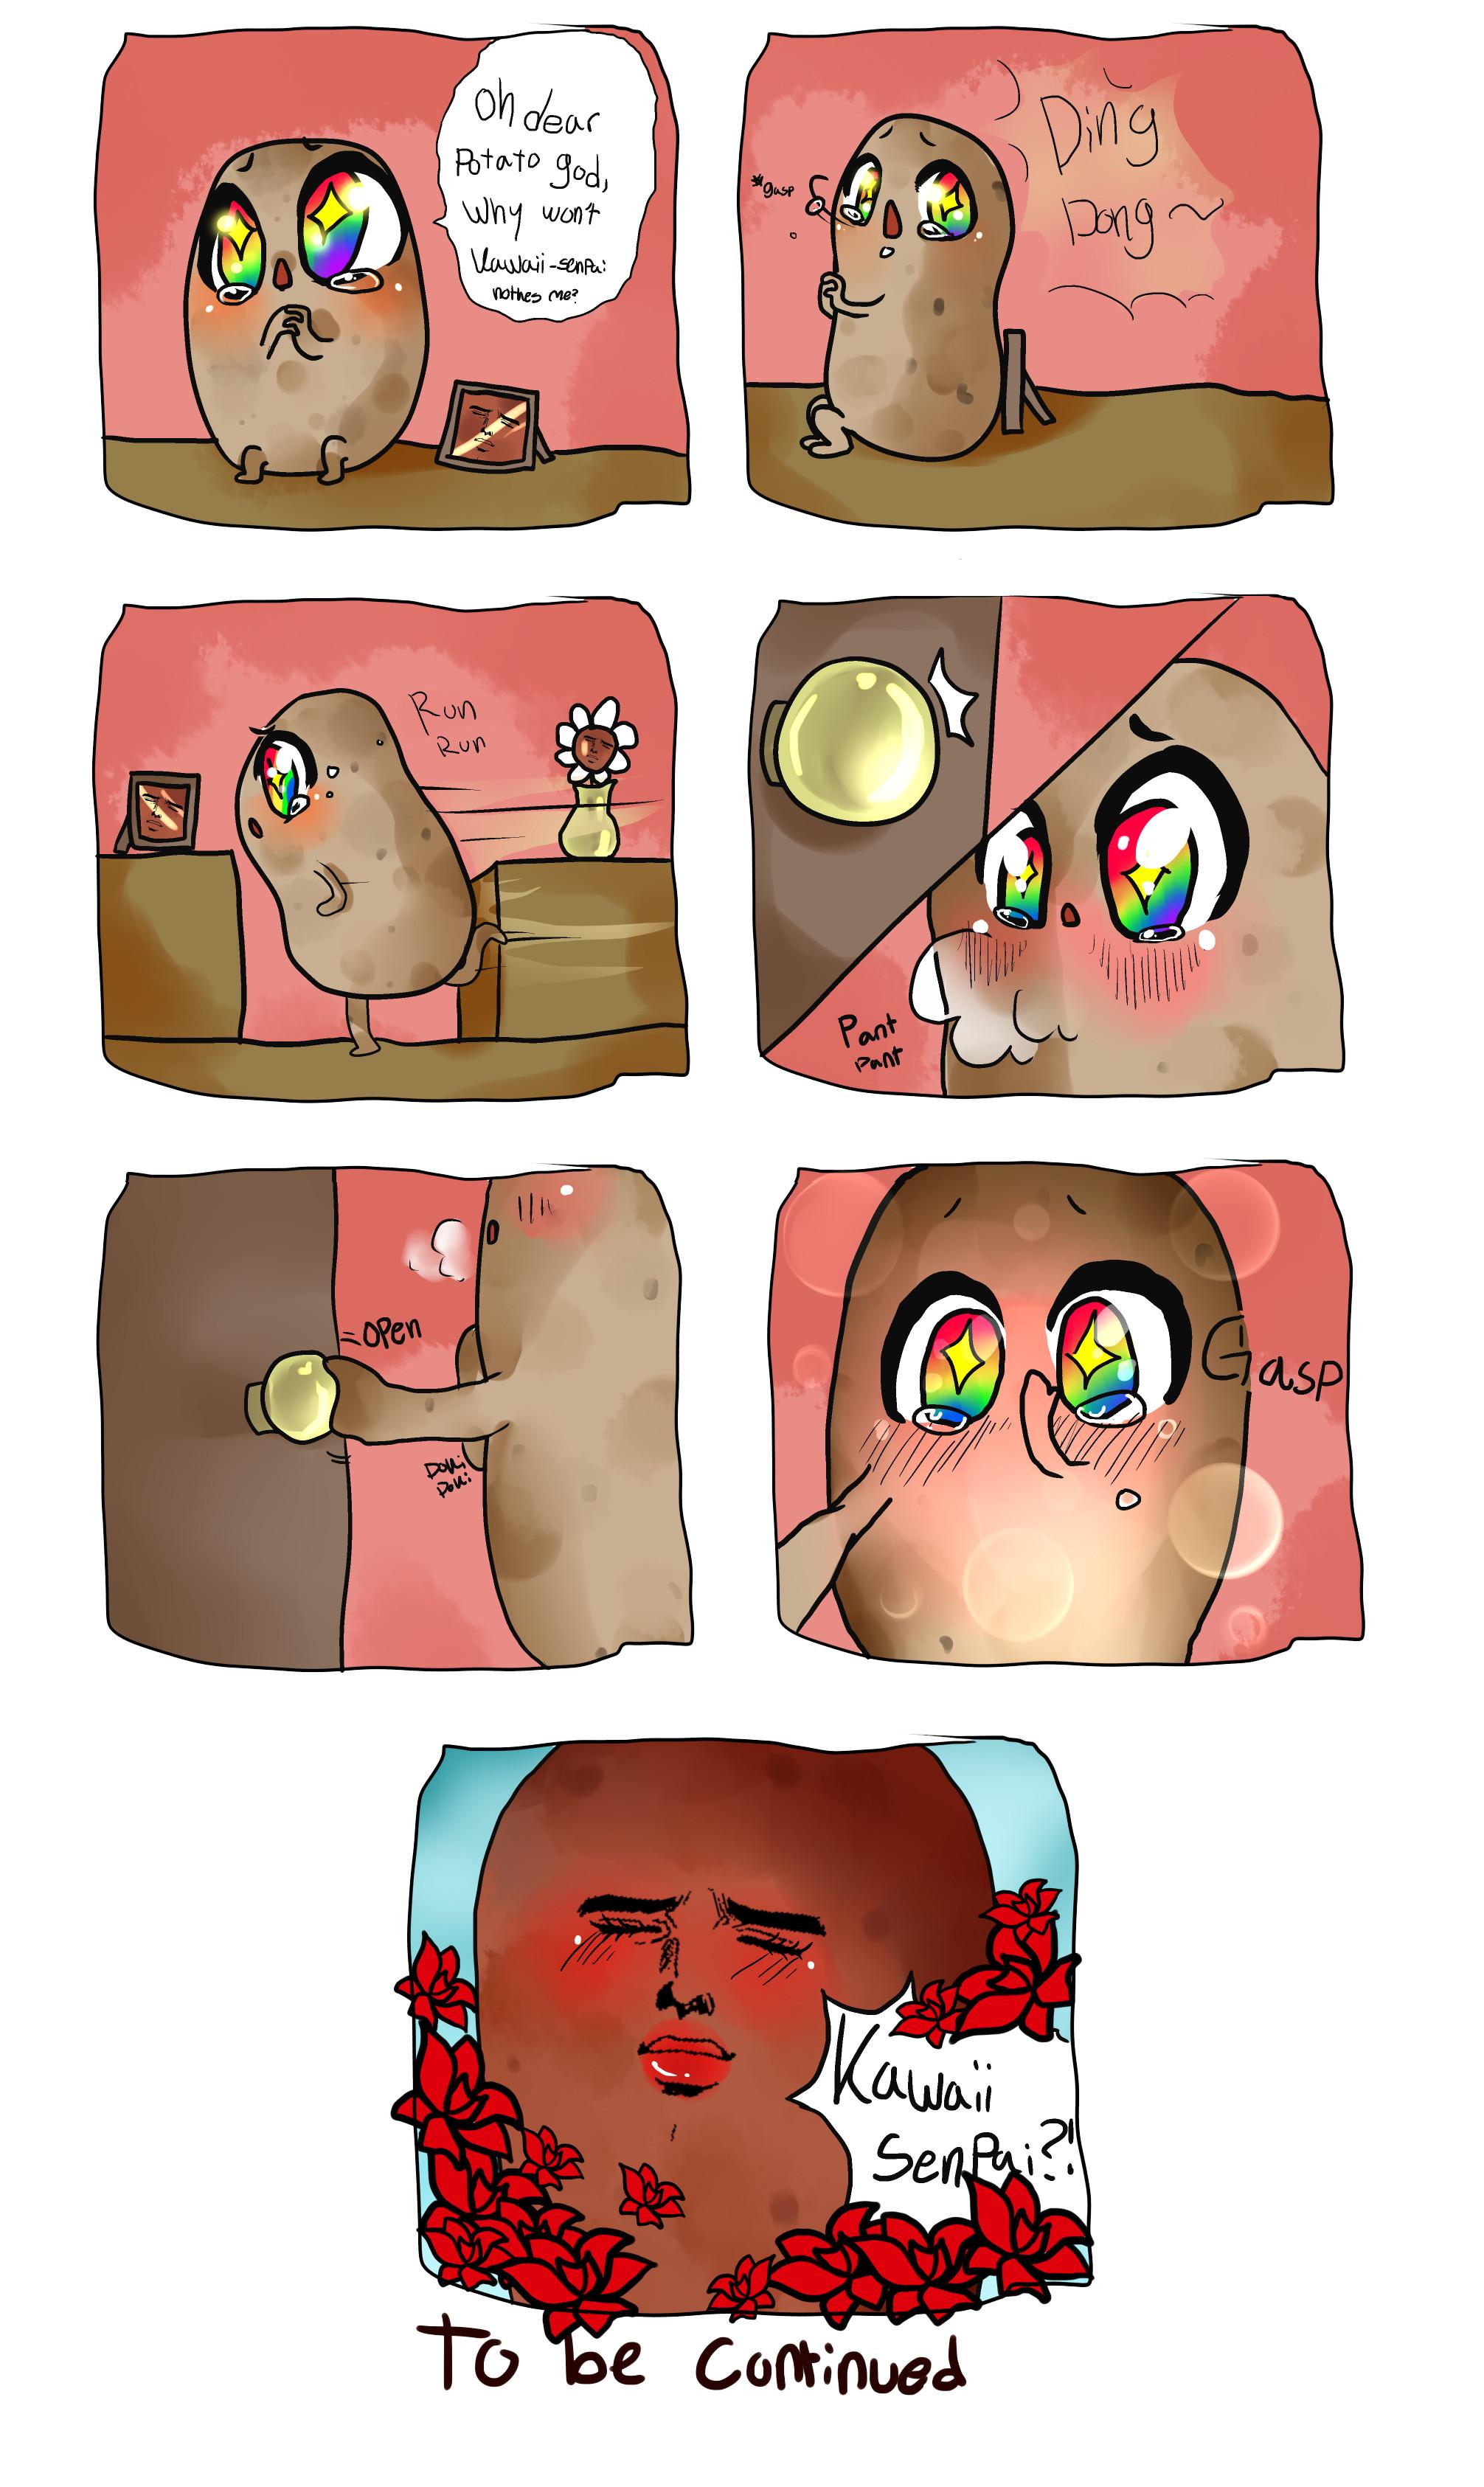 … StrawBerryAngel937 Kawaii potato comic part 1 by StrawBerryAngel937